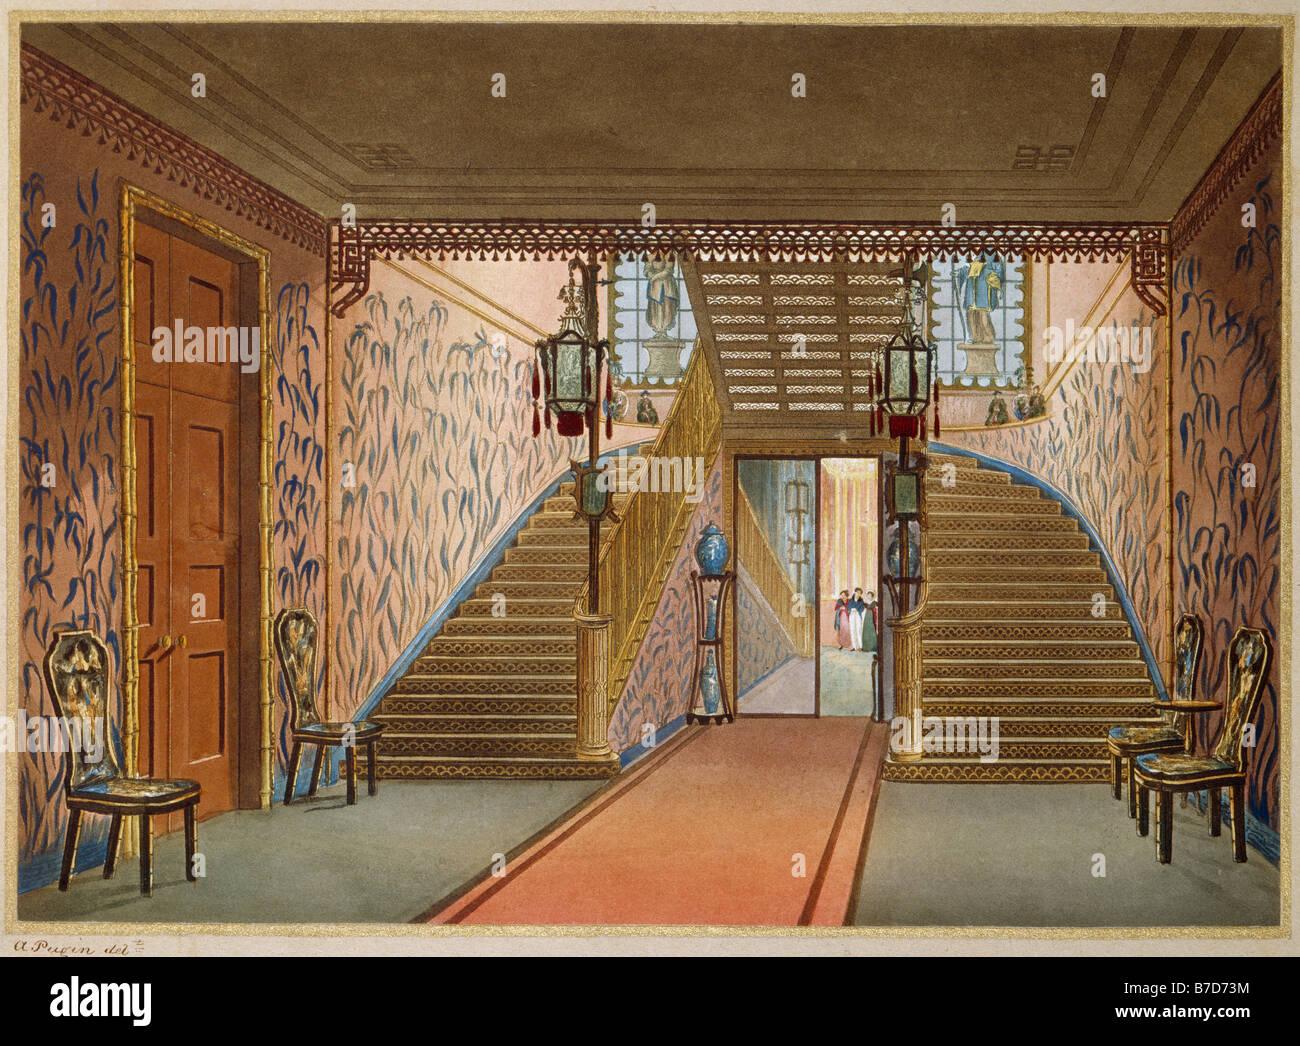 Royal Pavilion Brighton Staircase Nash & Pugin - Stock Image